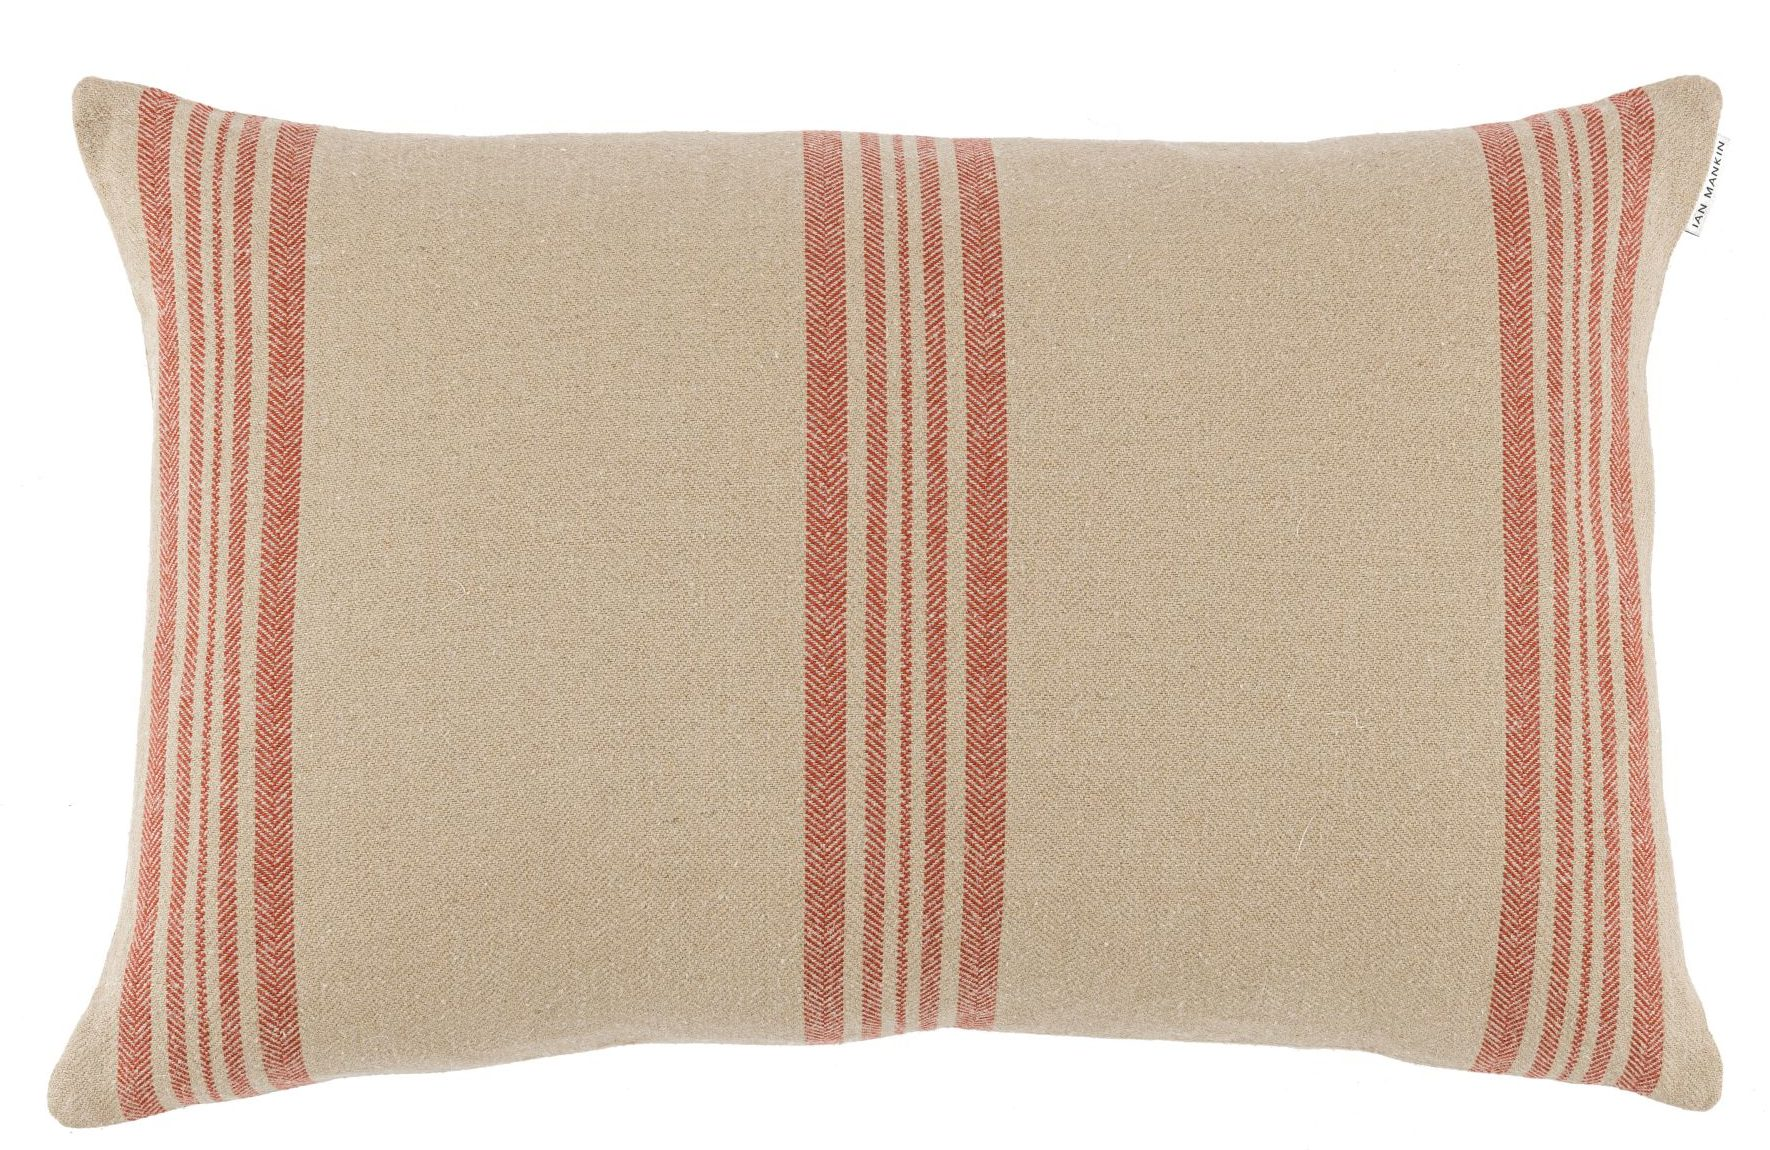 Ian Mankin Landmark 1485 Saddell Stripe Striped Russet Cushion CU279 199